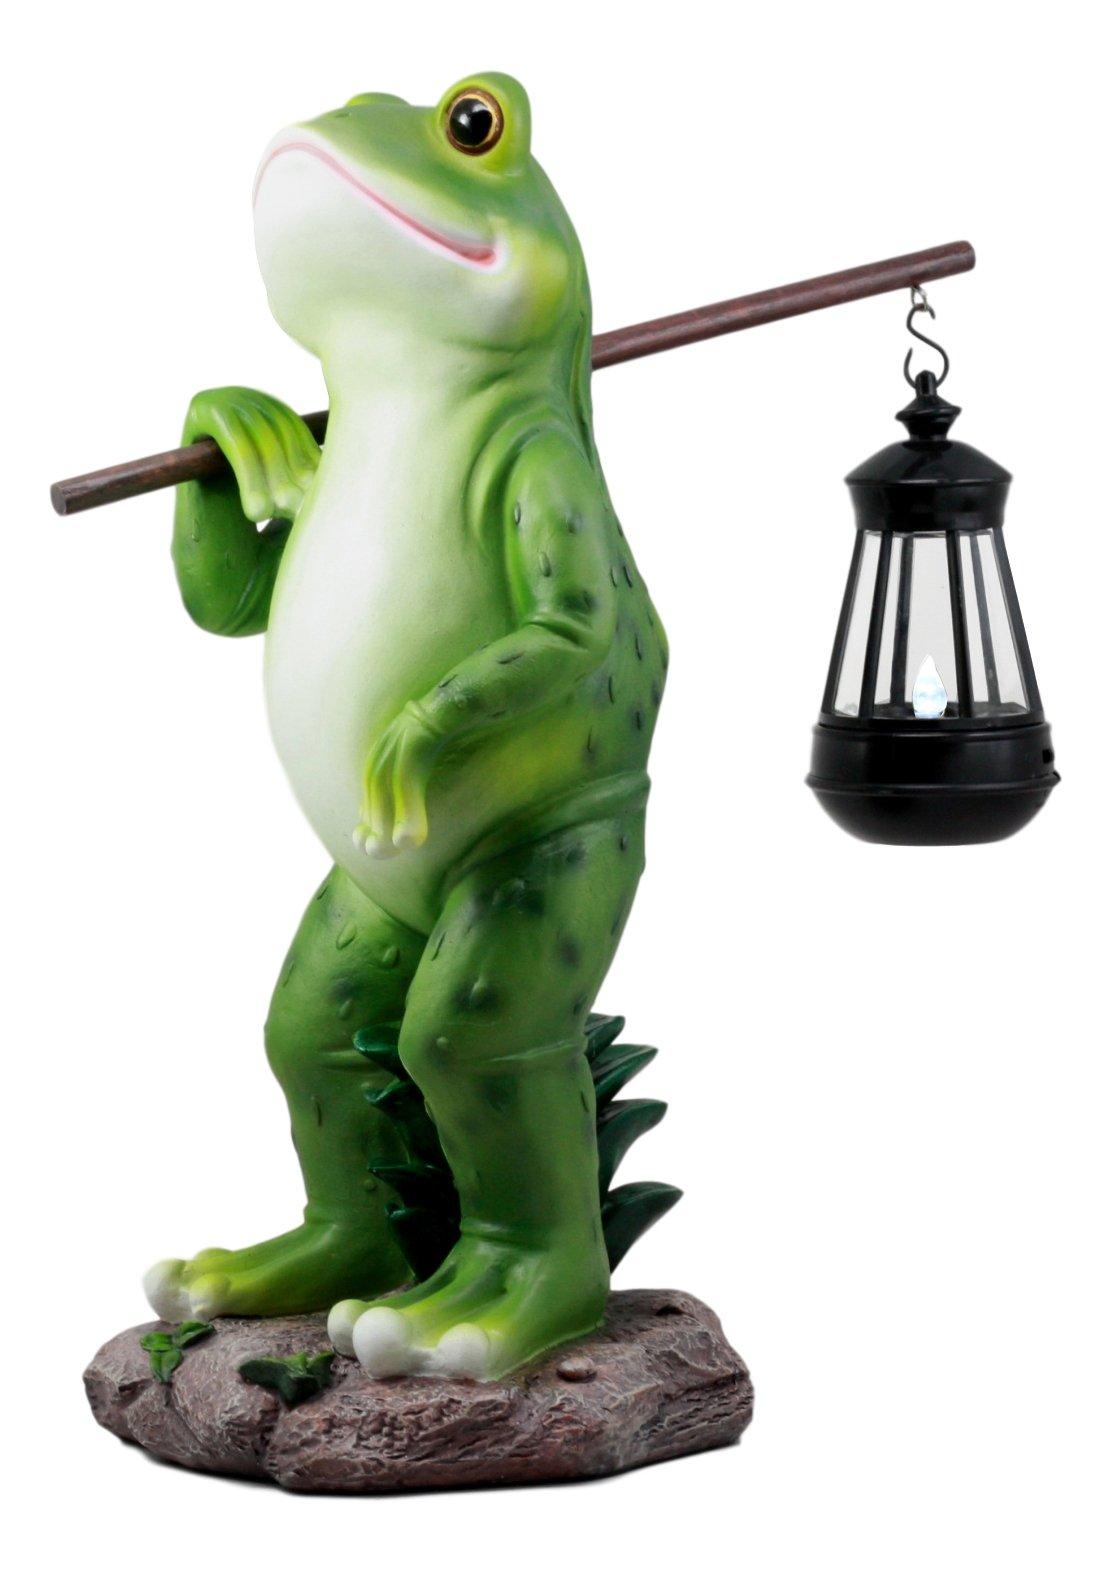 Ebros Blue Bayou Trails Hiking Frog Statue Holding Rod With Solar Powered Lantern LED Light Home Patio Decor Figurine